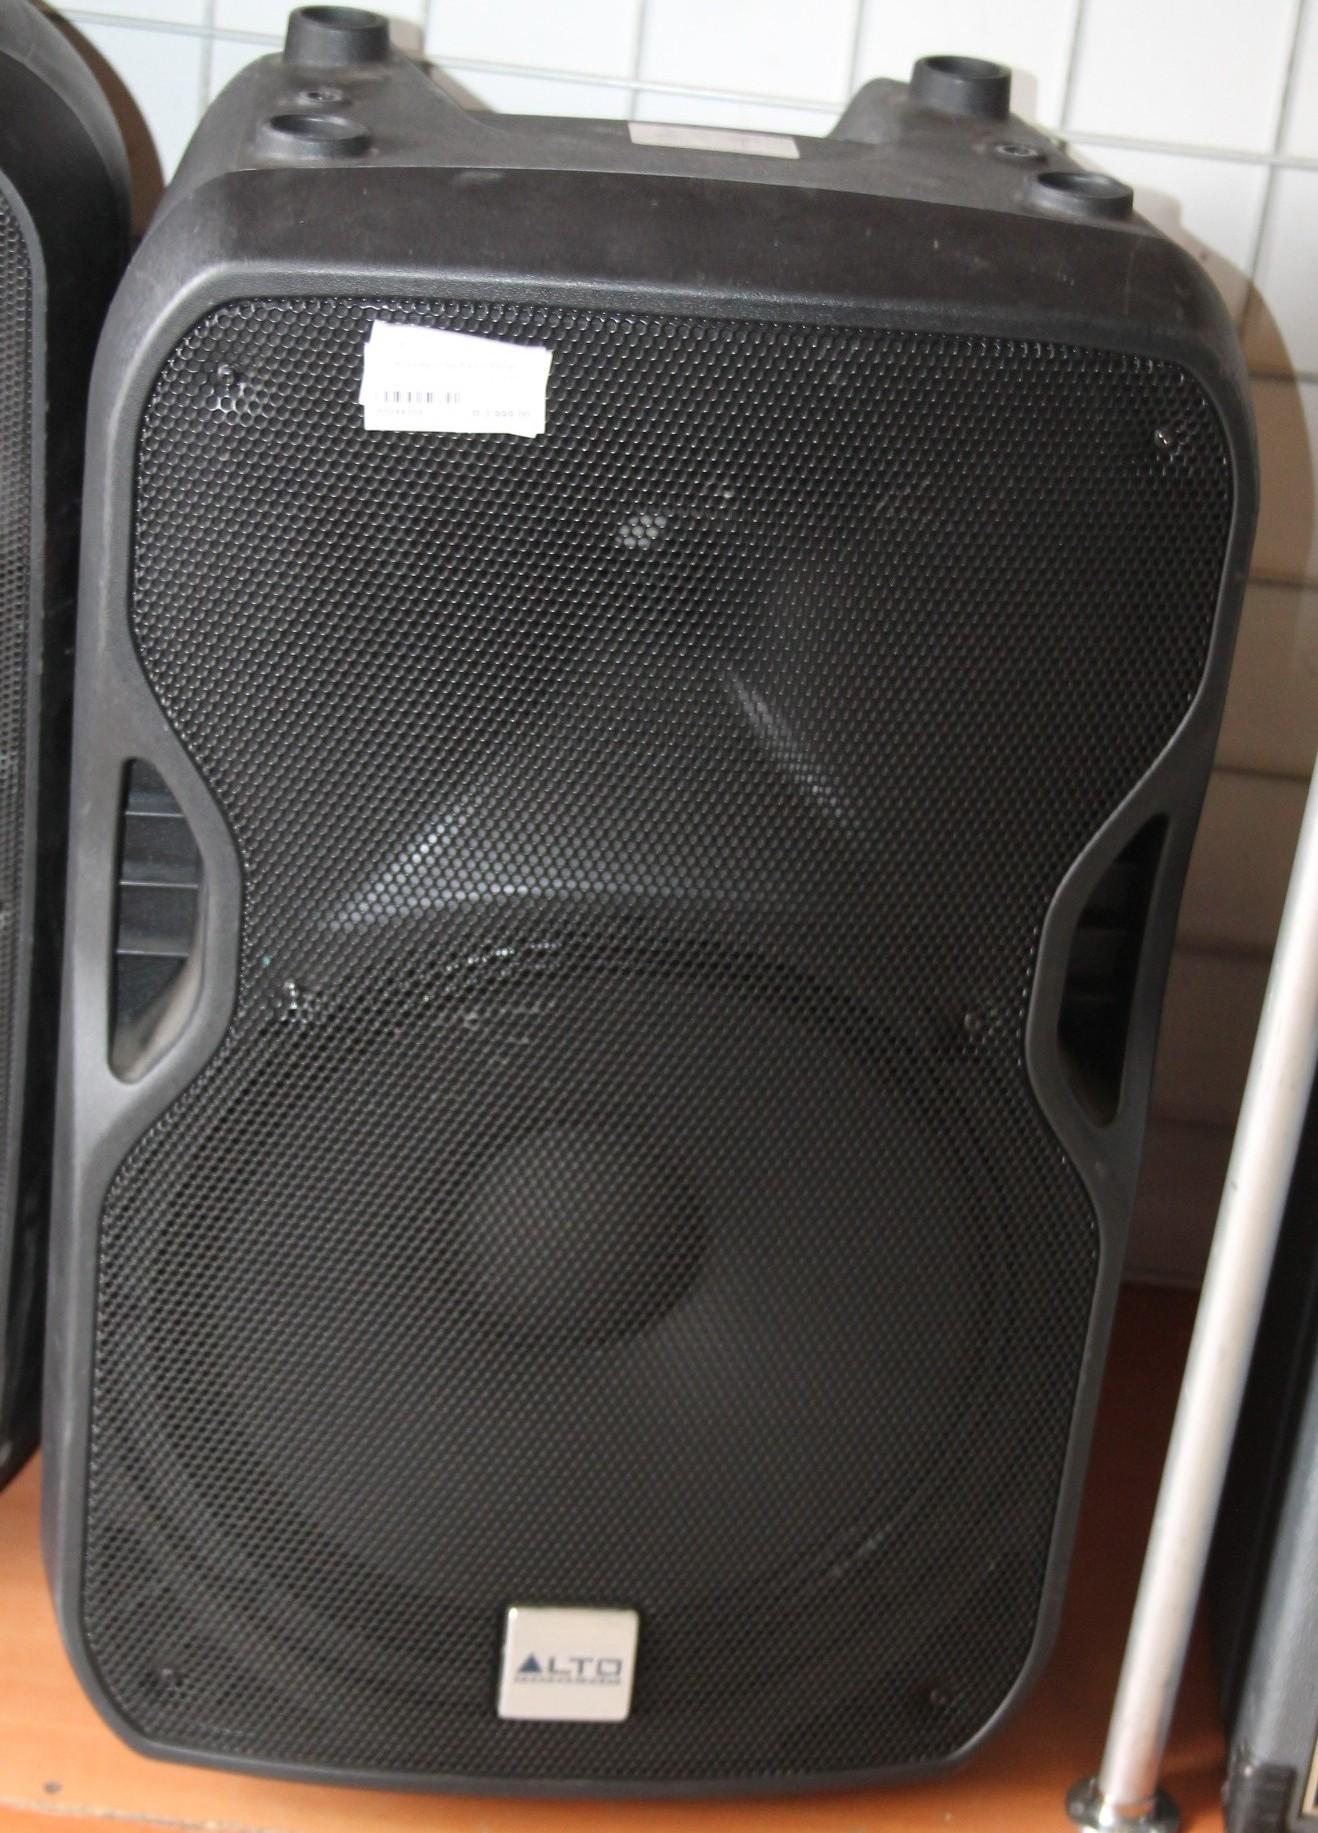 Alto speaker S028830a #Rosettenvillepawnshop